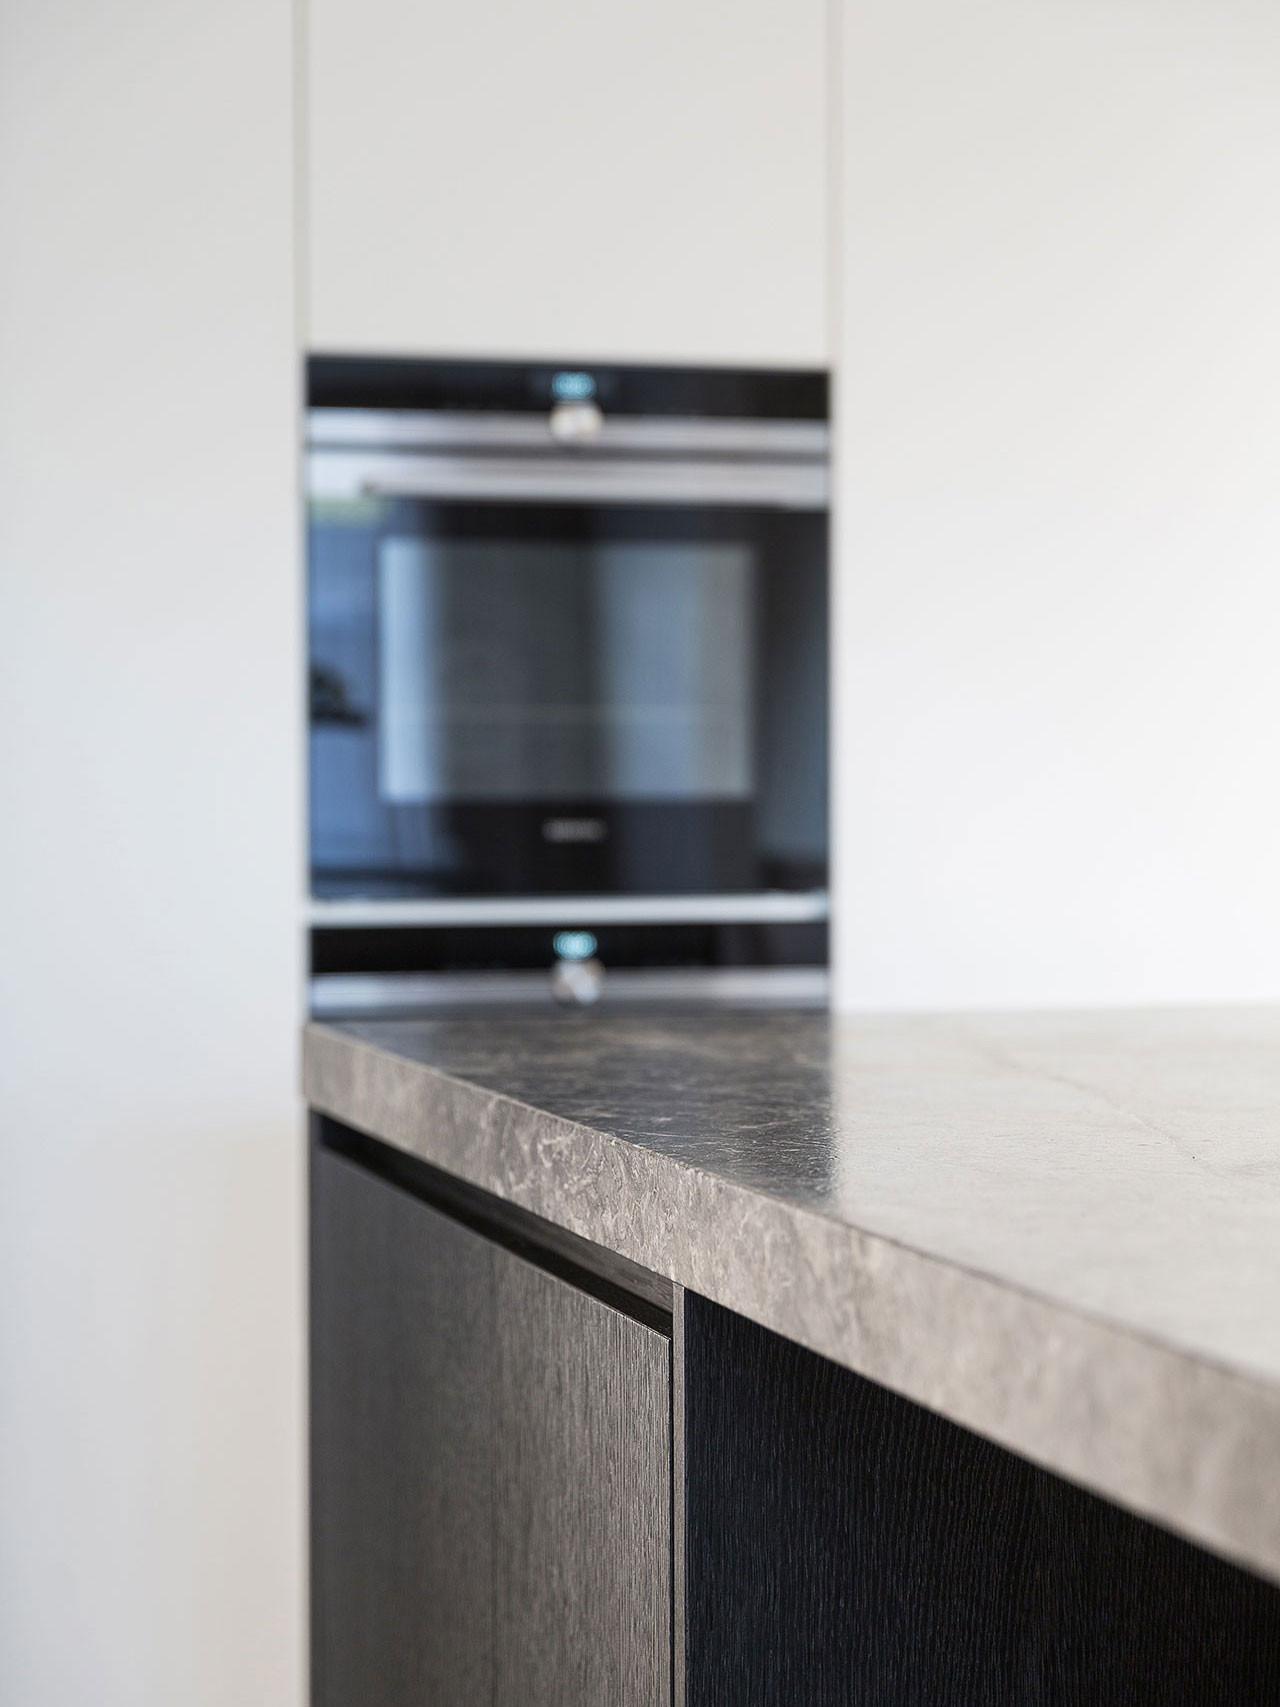 Dekeyzer-hedendaagse-keuken-donkere-eik-satijnlak-marmer-4.jpg